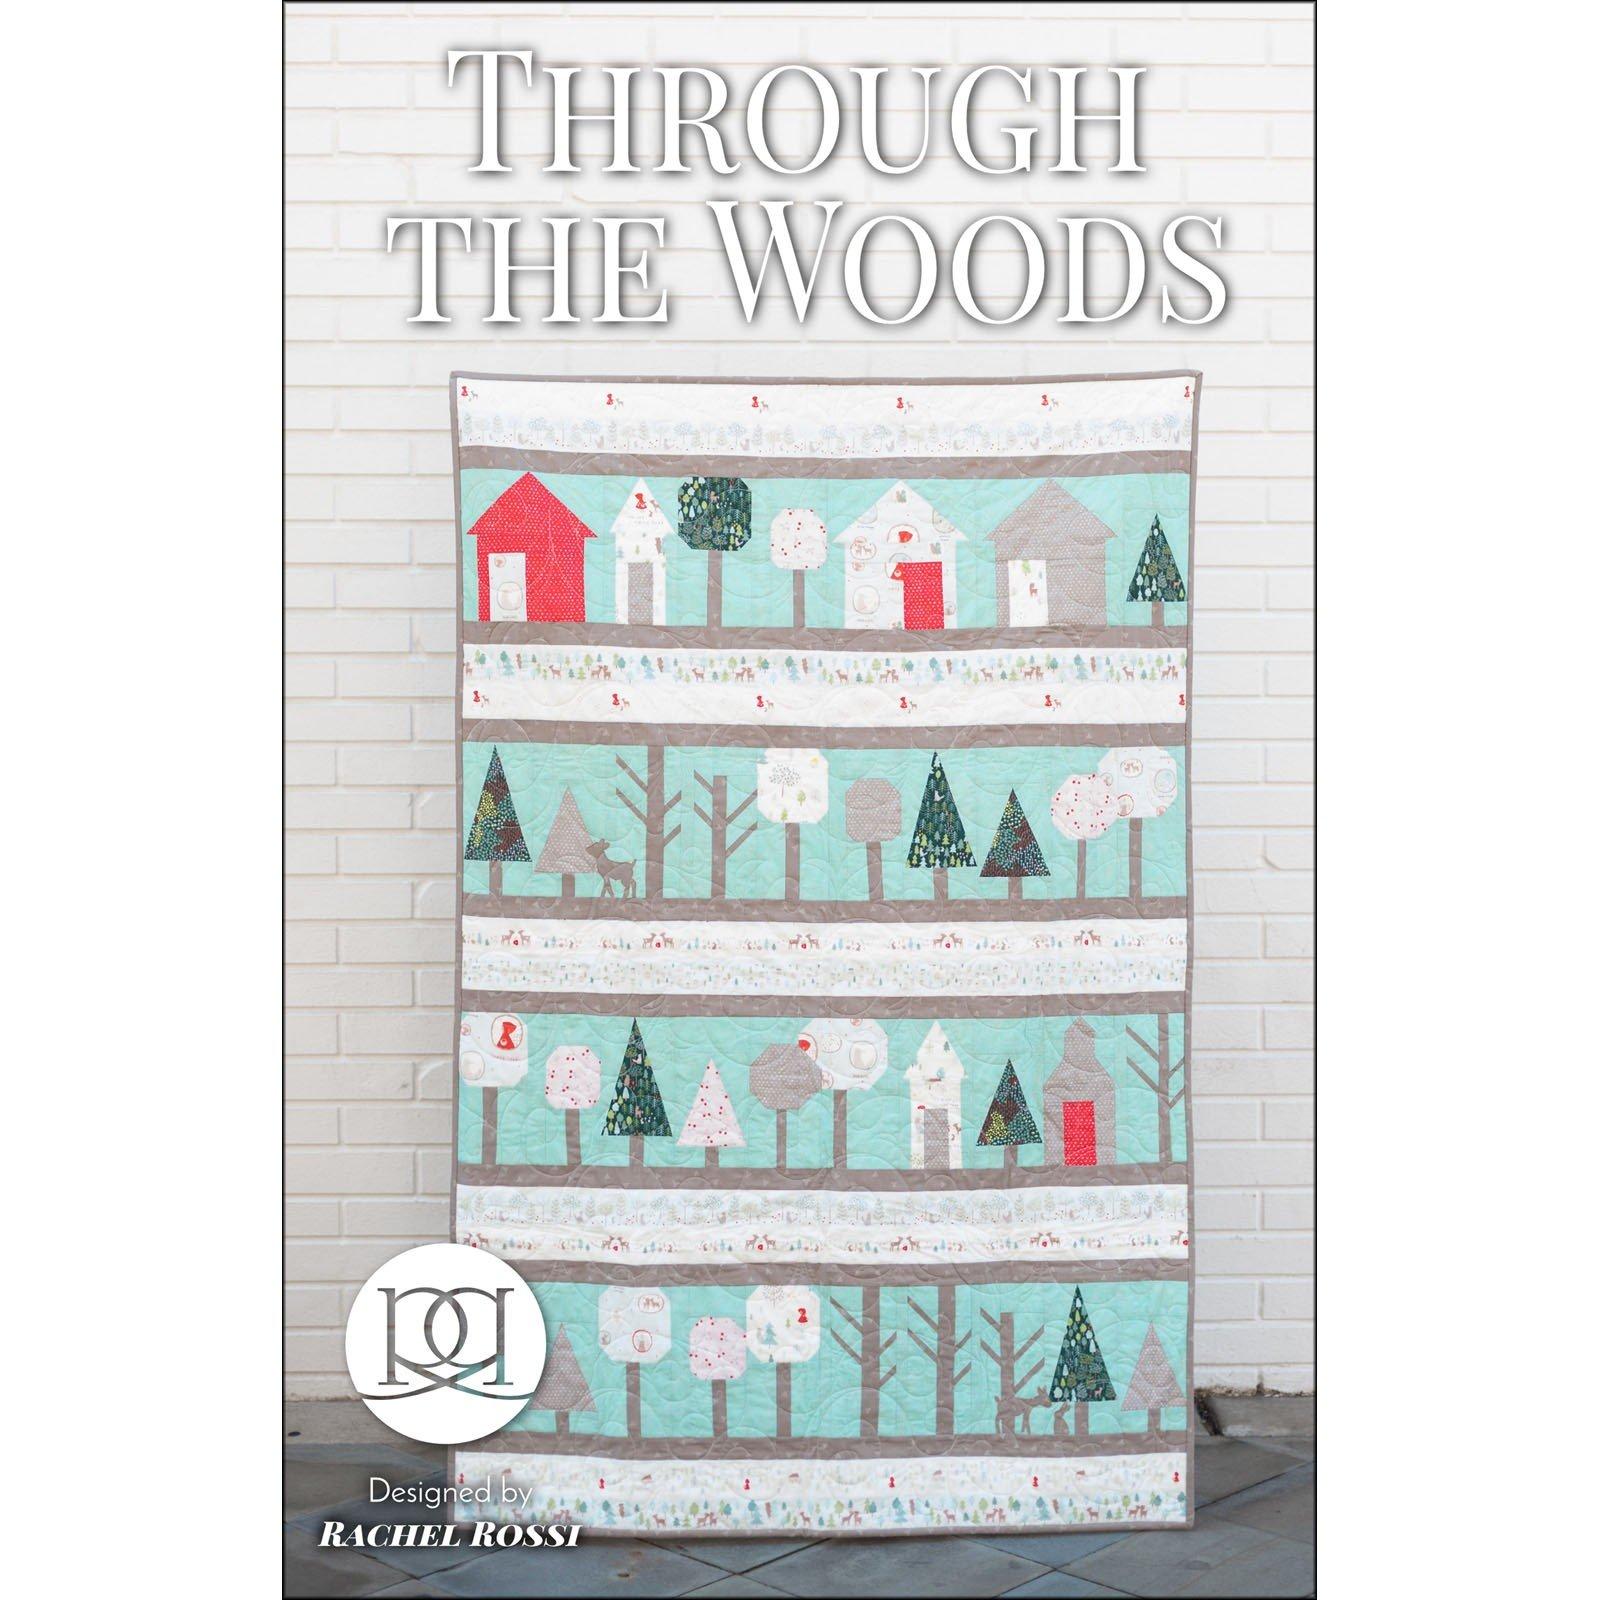 Through The Woods<br/>Rachel Rossi Designs